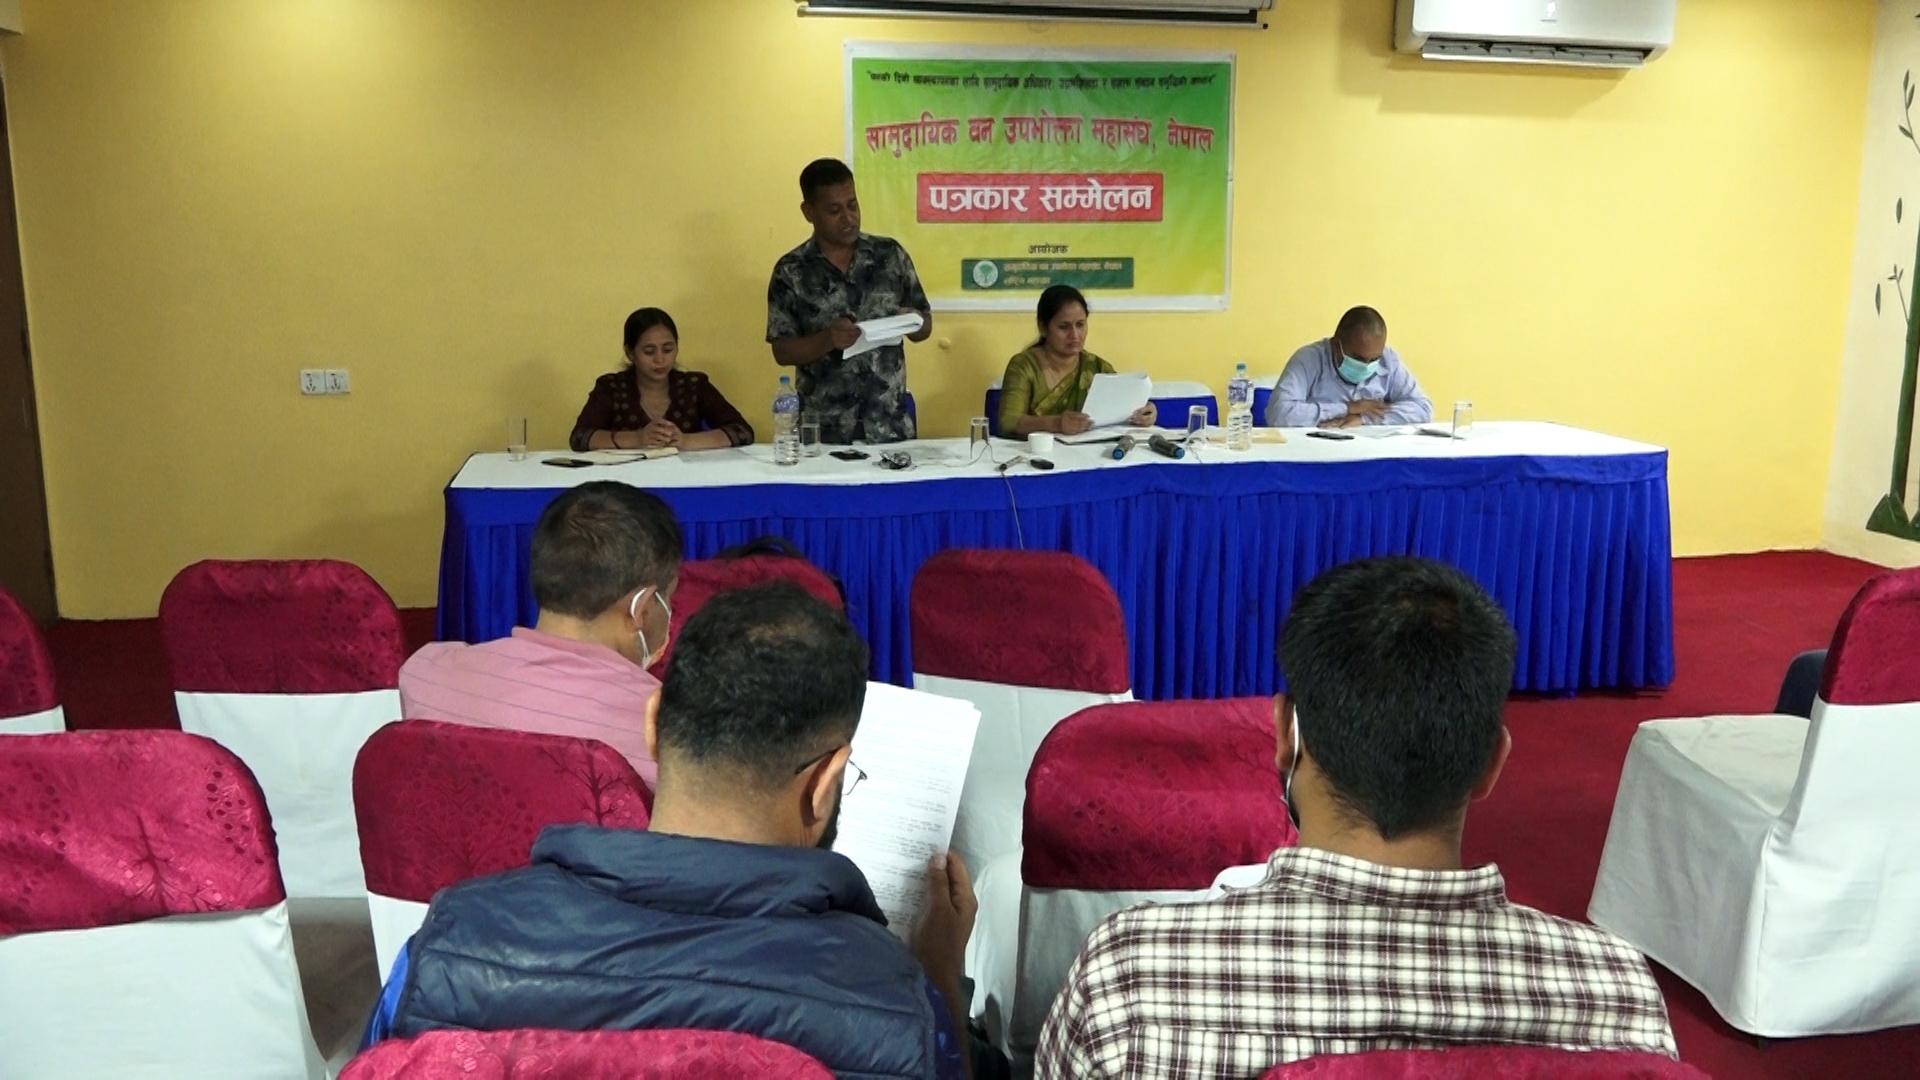 सामुदायिक वन उपभोक्ता महासंघको घोषणा पत्र सार्वजनिक